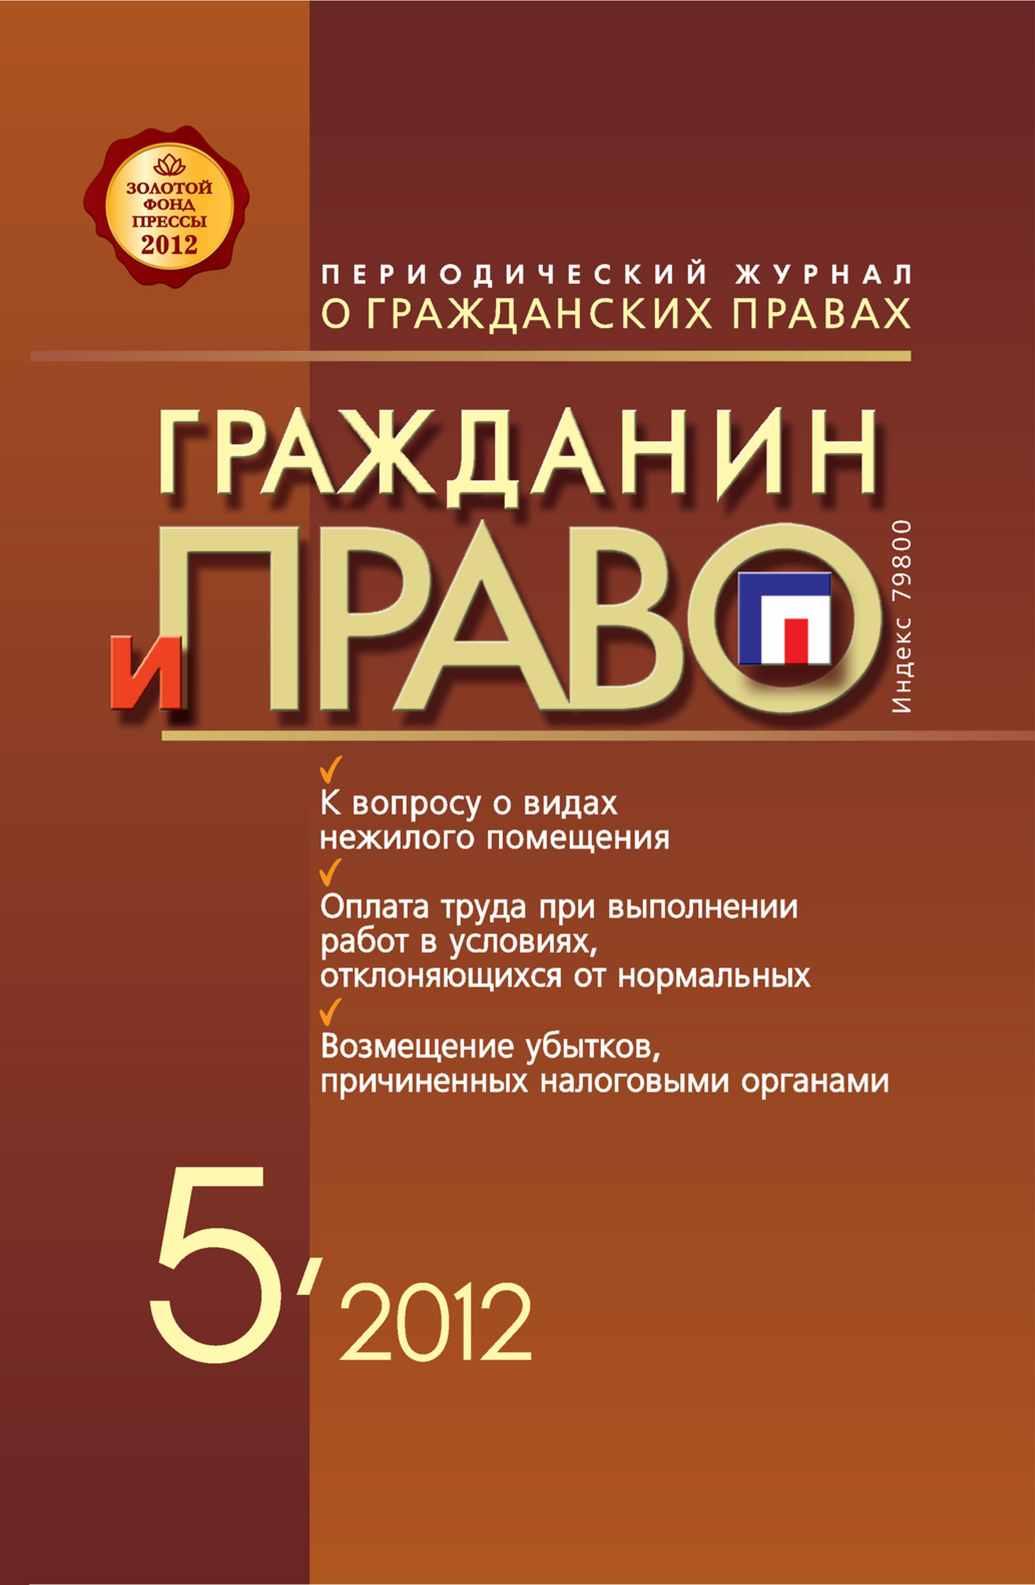 Гражданин и право №05/2012